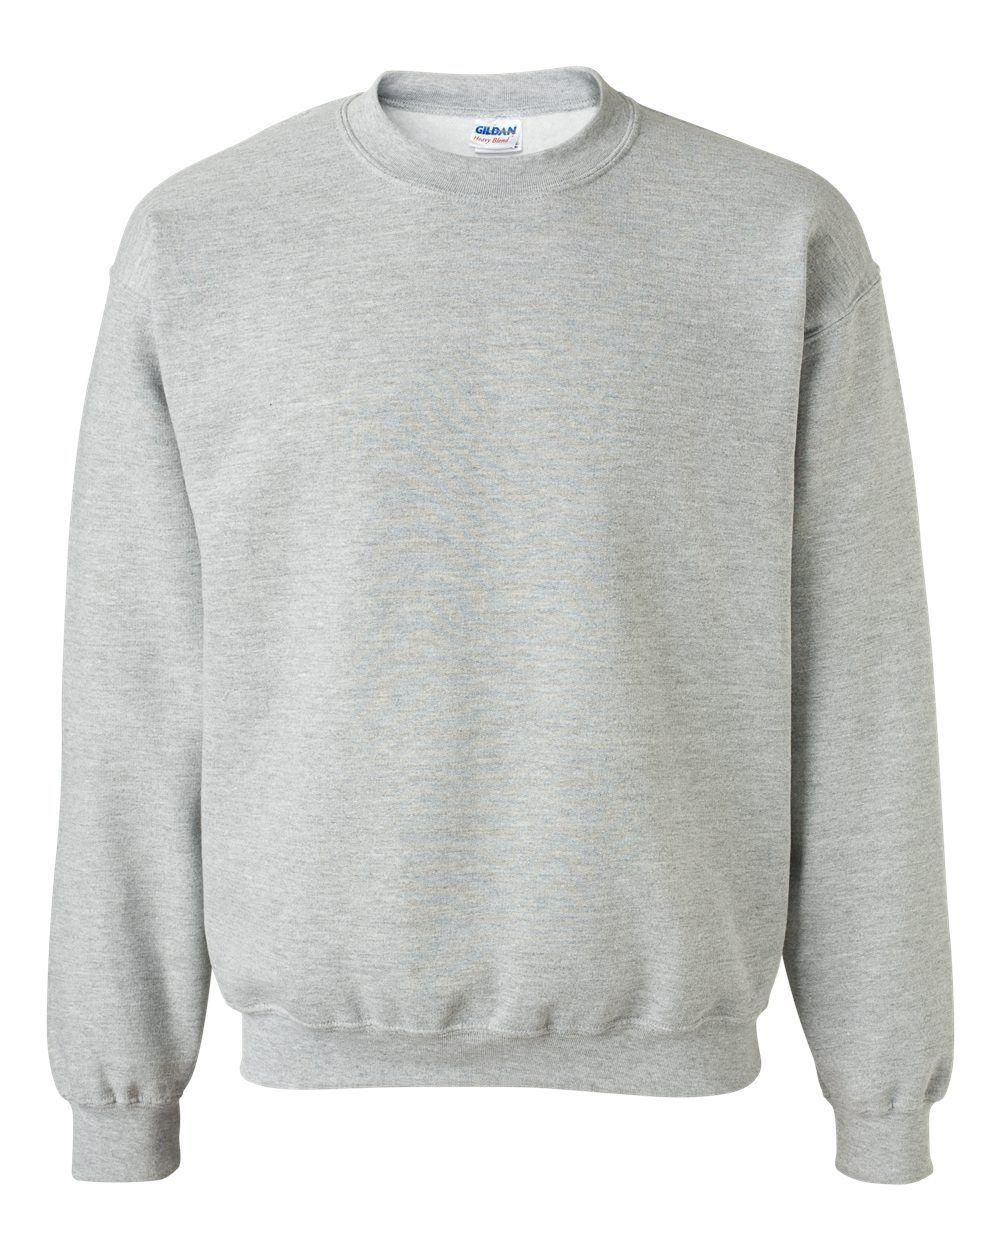 Design your own t-shirt gildan - Gildan Hoodie Dark Grey Item 18000